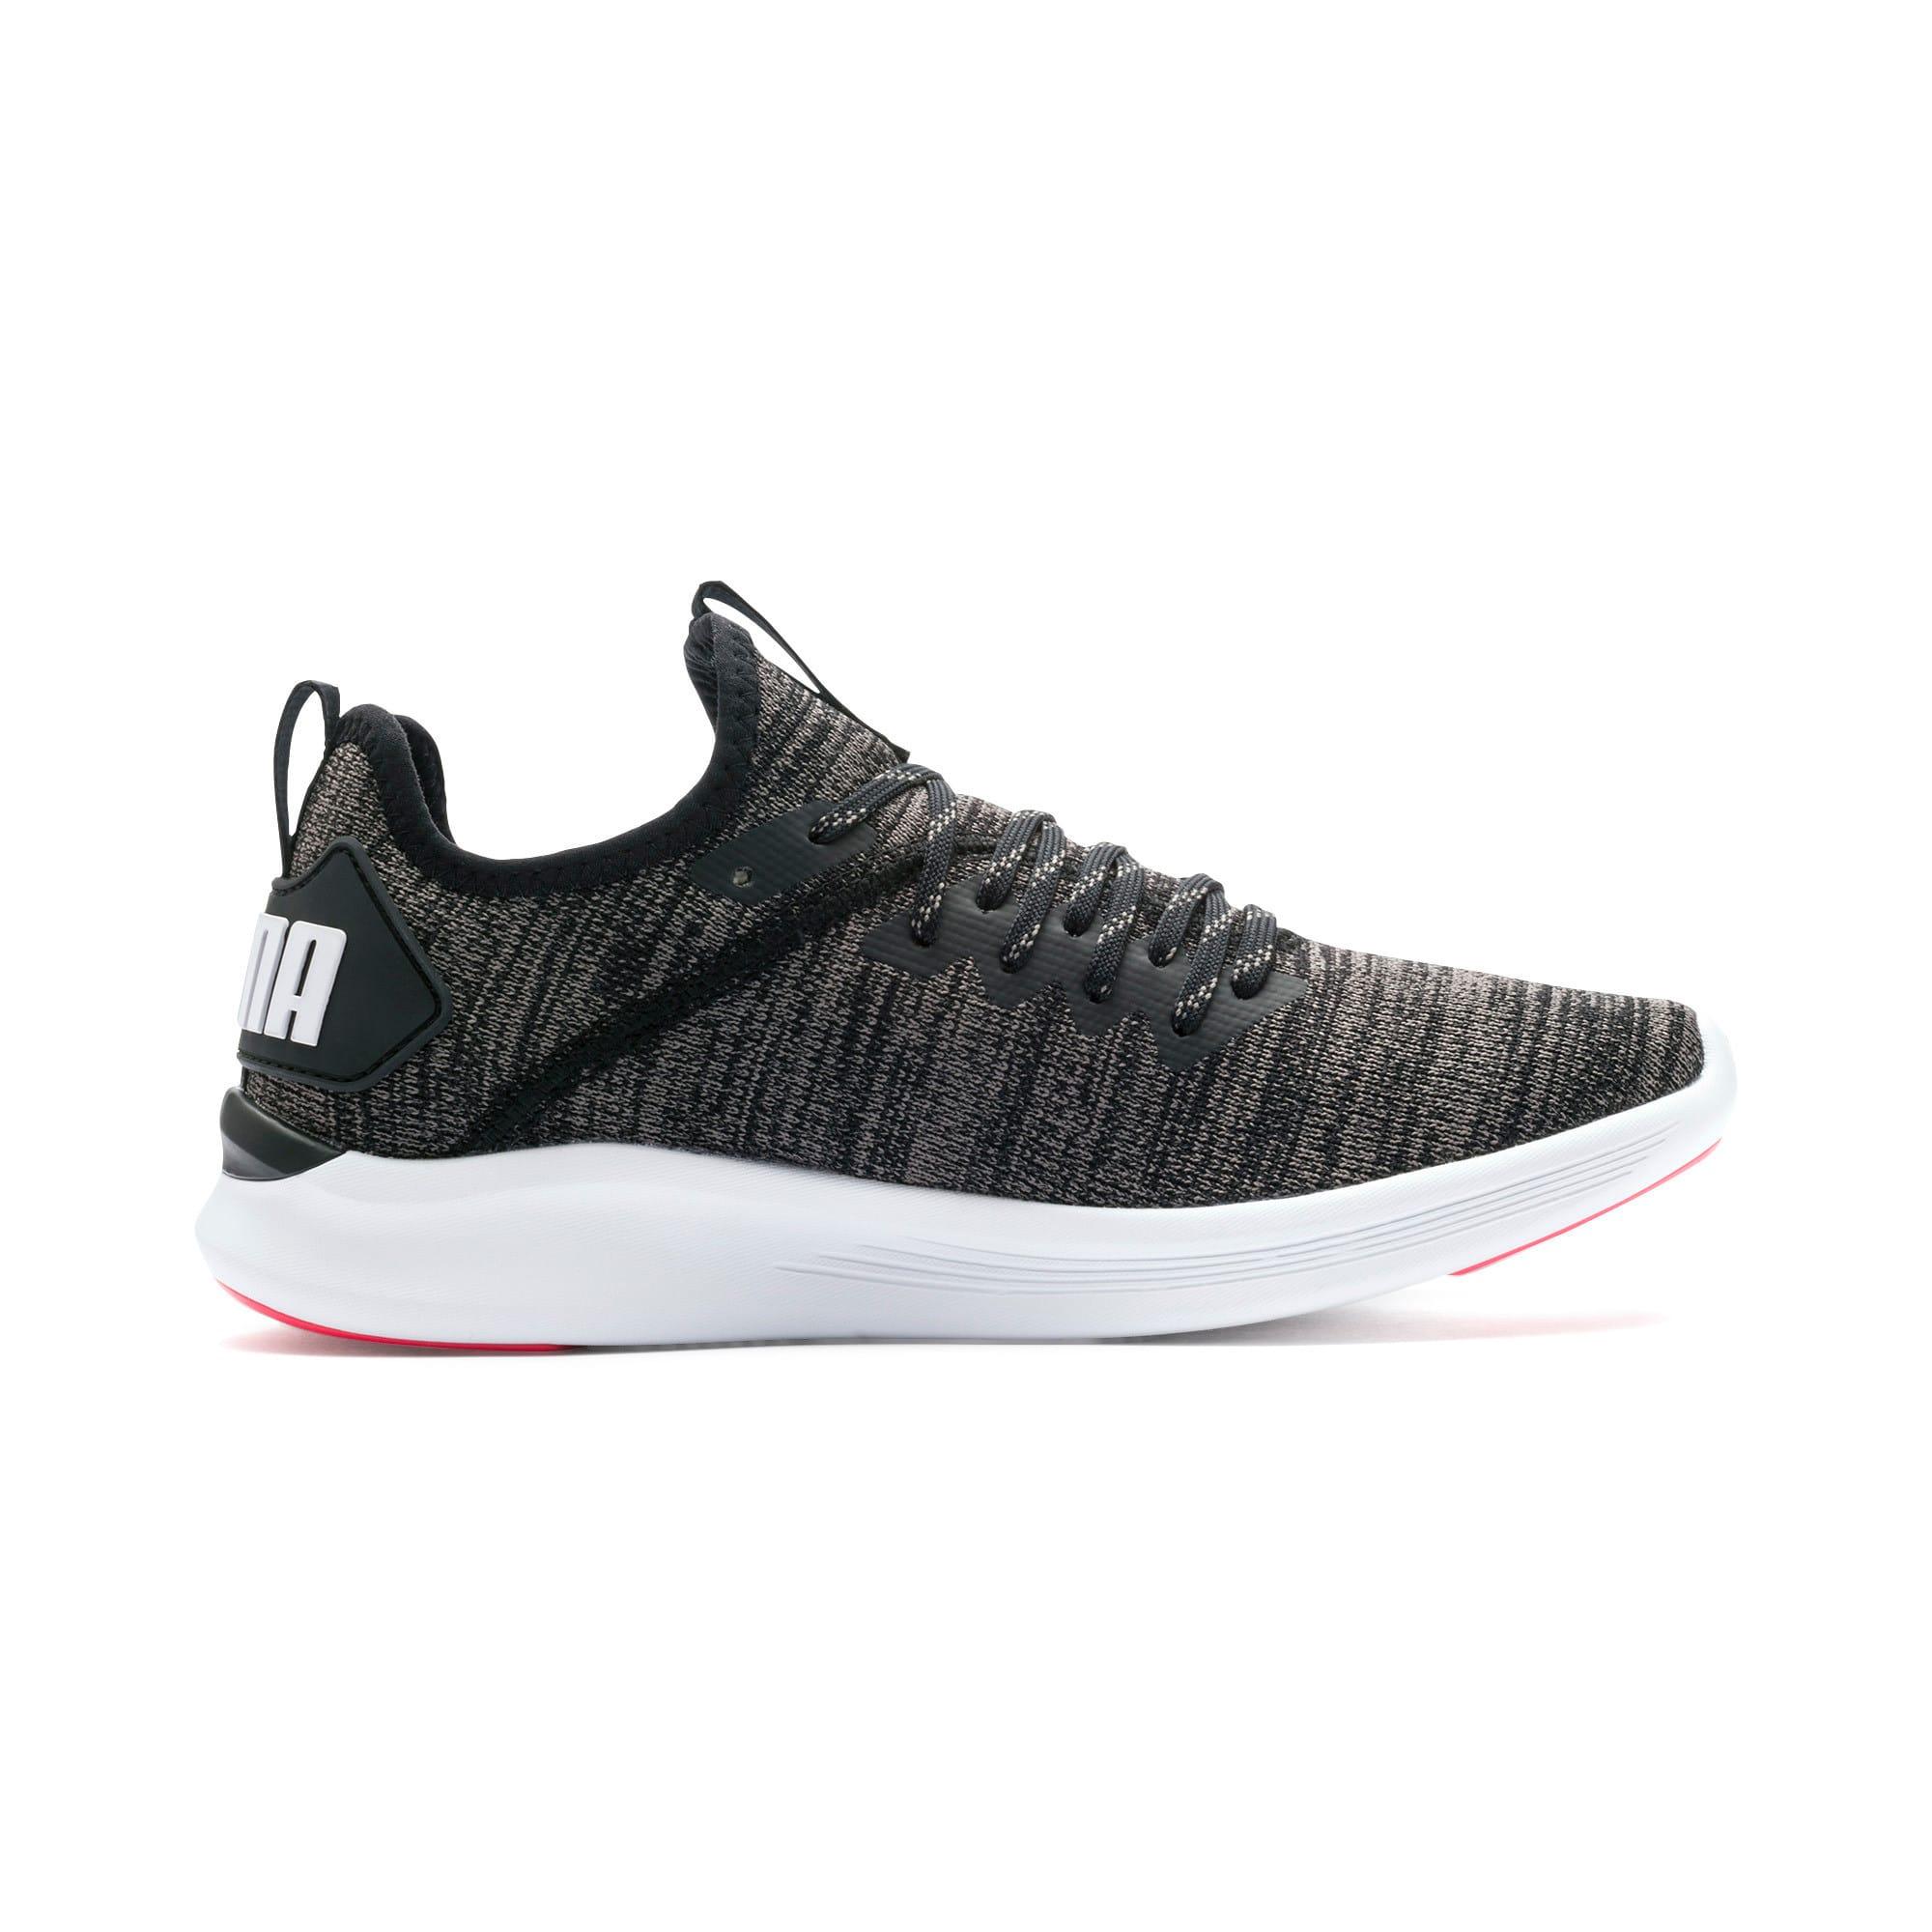 Thumbnail 6 of IGNITE Flash evoKNIT Women's Running Shoes, Black-White-Pink Alert, medium